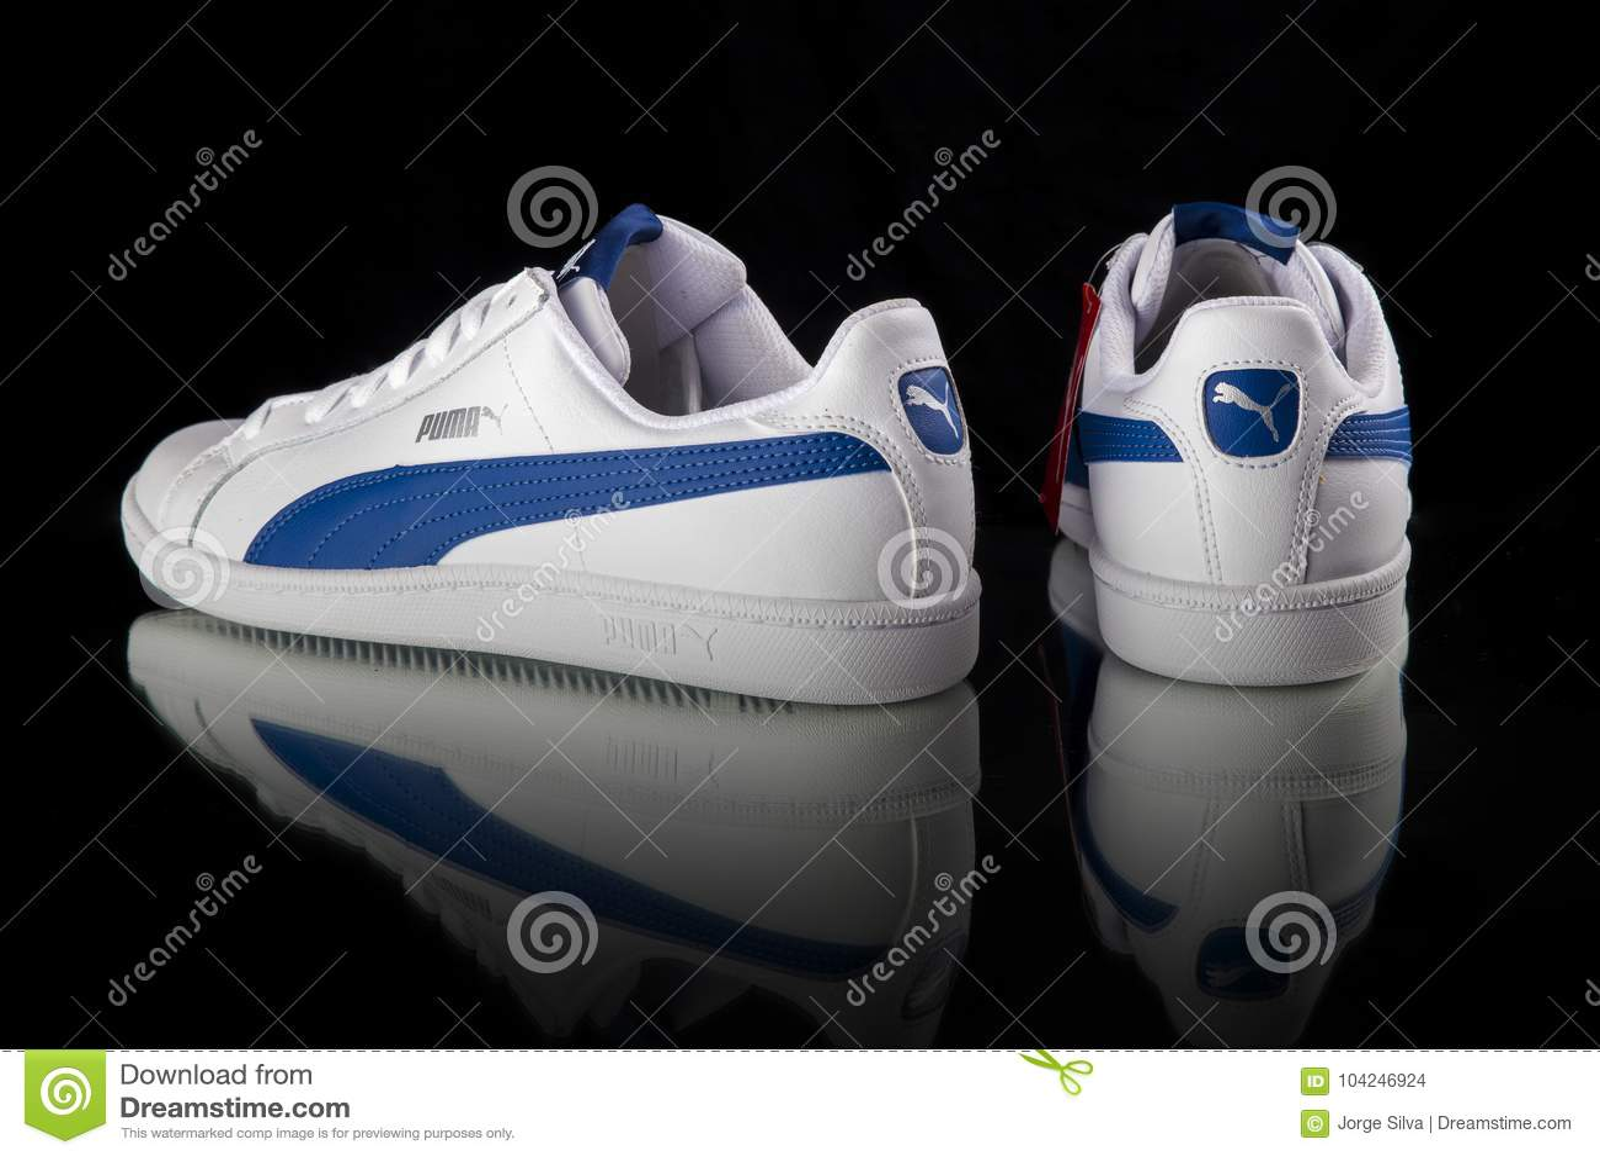 ad2b692a93 Κλασικό πάνινο παπούτσι Puma Εκδοτική Στοκ Εικόνα - εικόνα από ...